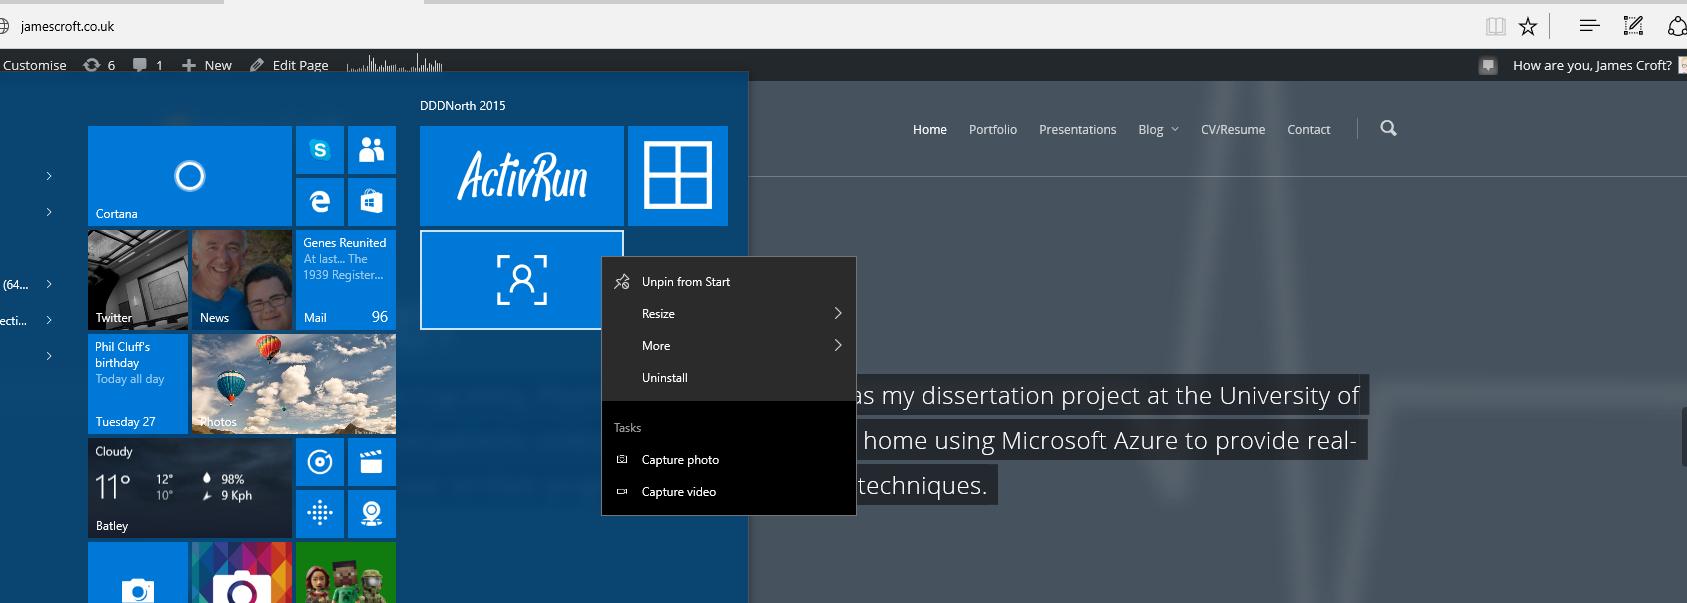 Windows 10 Jumplist